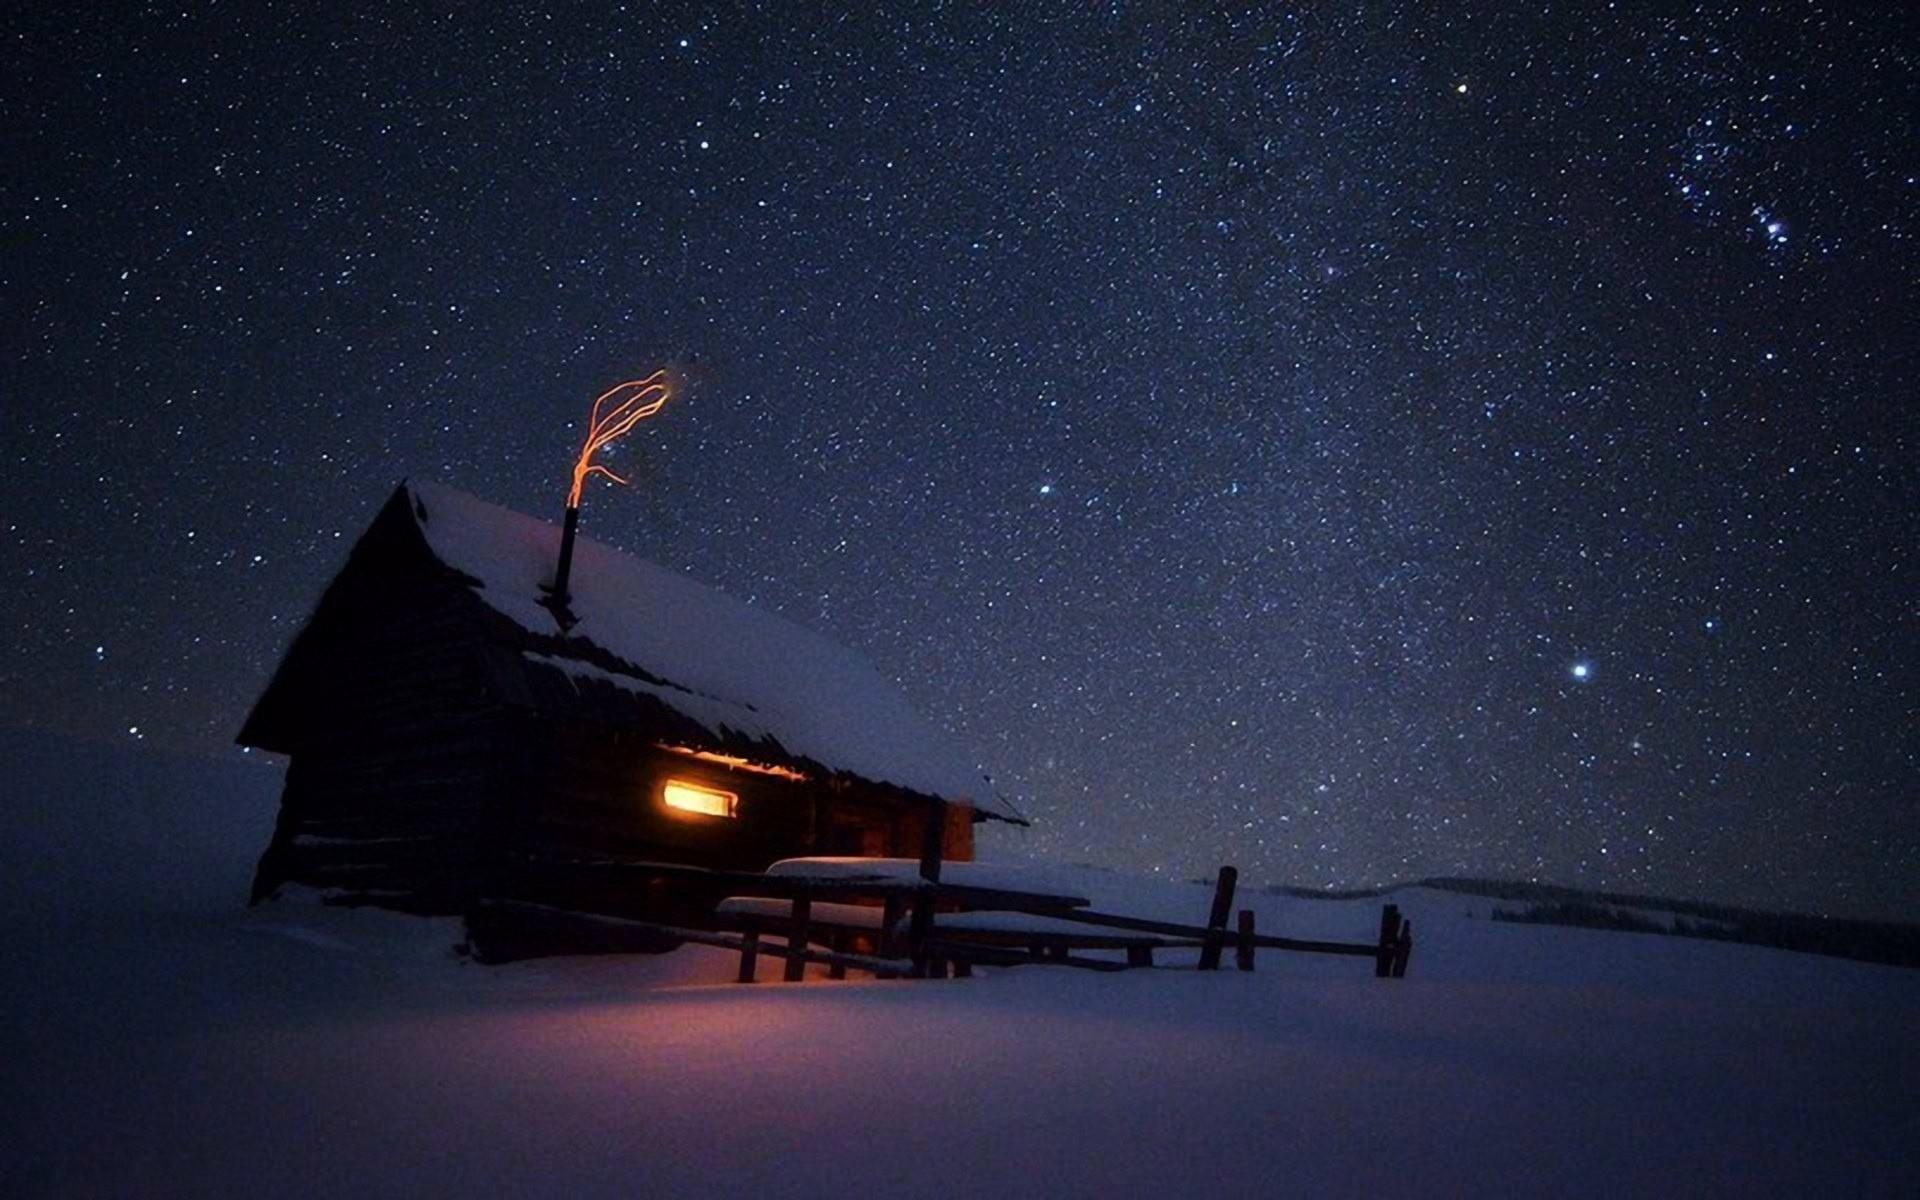 Winter Night Stars wallpaper HD desktop.